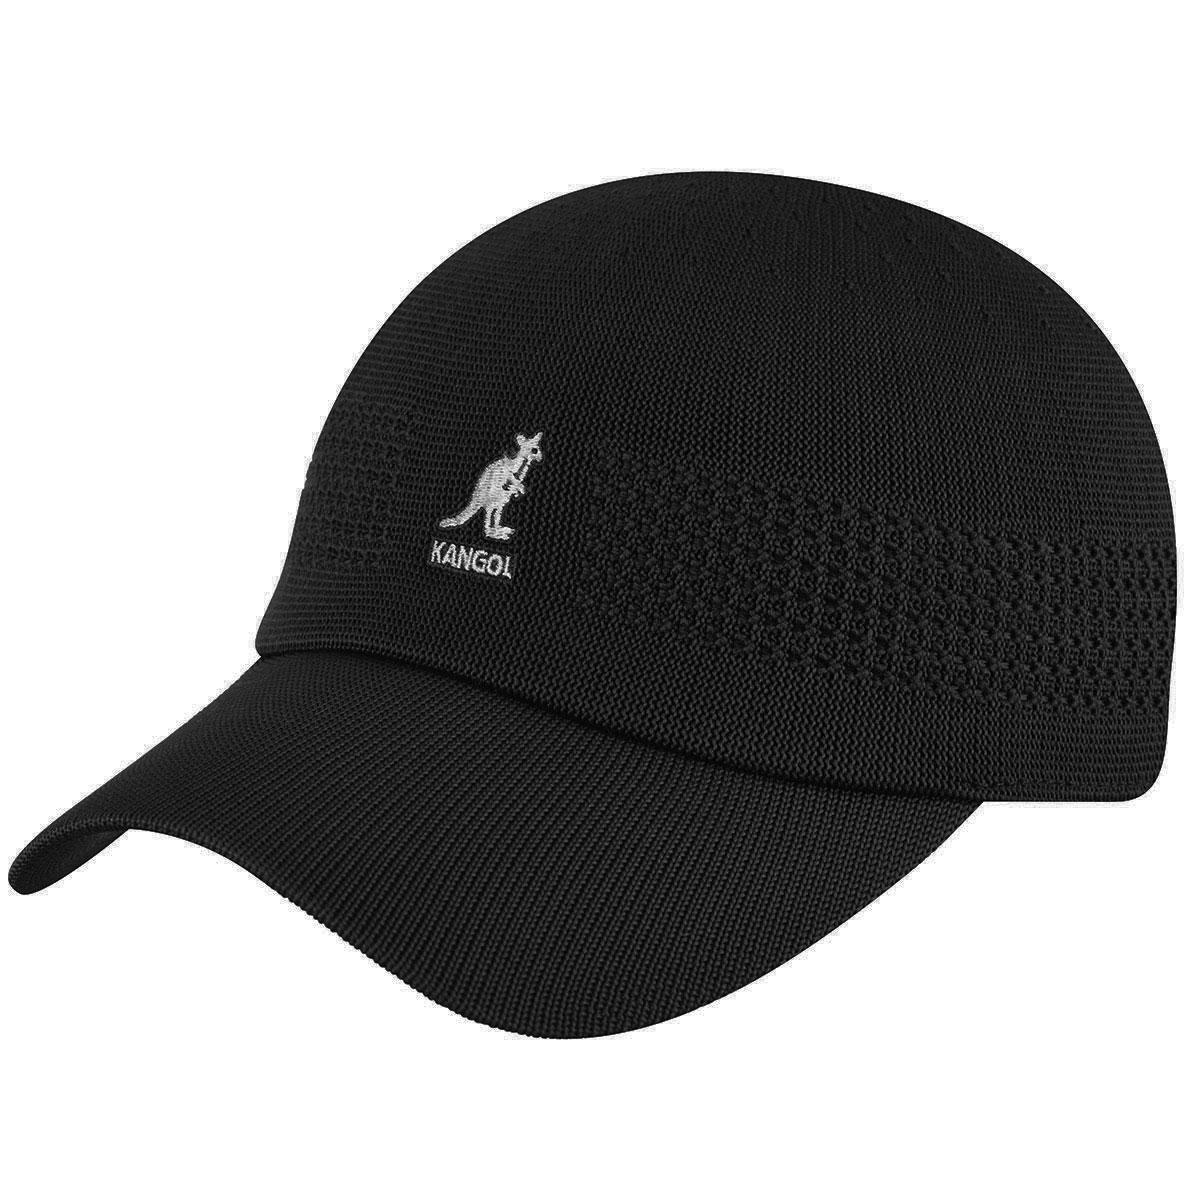 Kangol Tropic Ventair Spacecap in Black